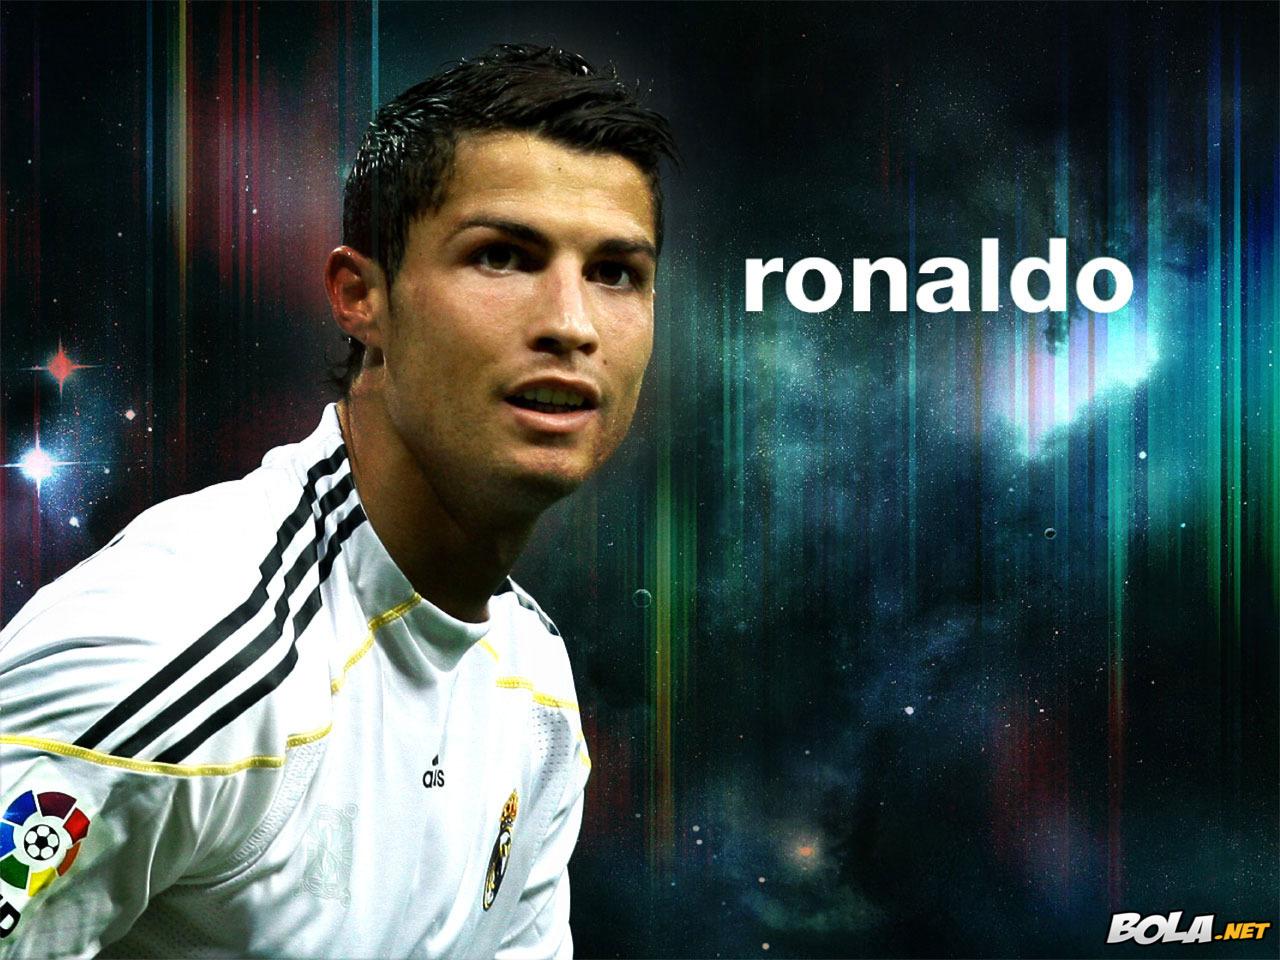 Cristiano Ronaldo Wallpapers 2012   C Ronaldo Latest Wallpapers 1280x960